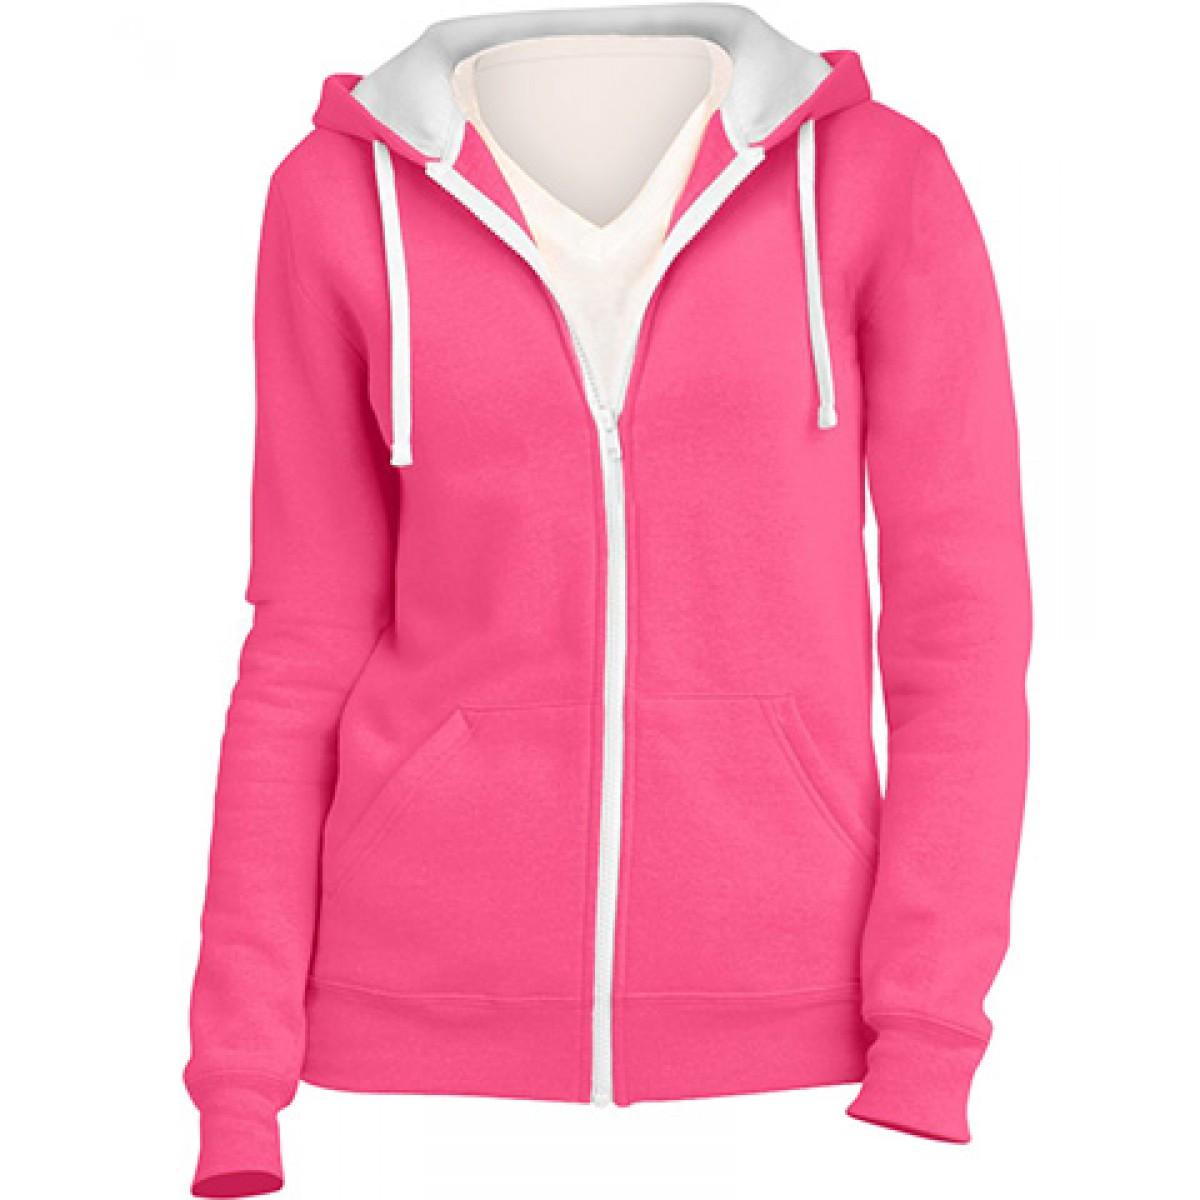 Juniors Full-Zip Hoodie-Neon Pink-L